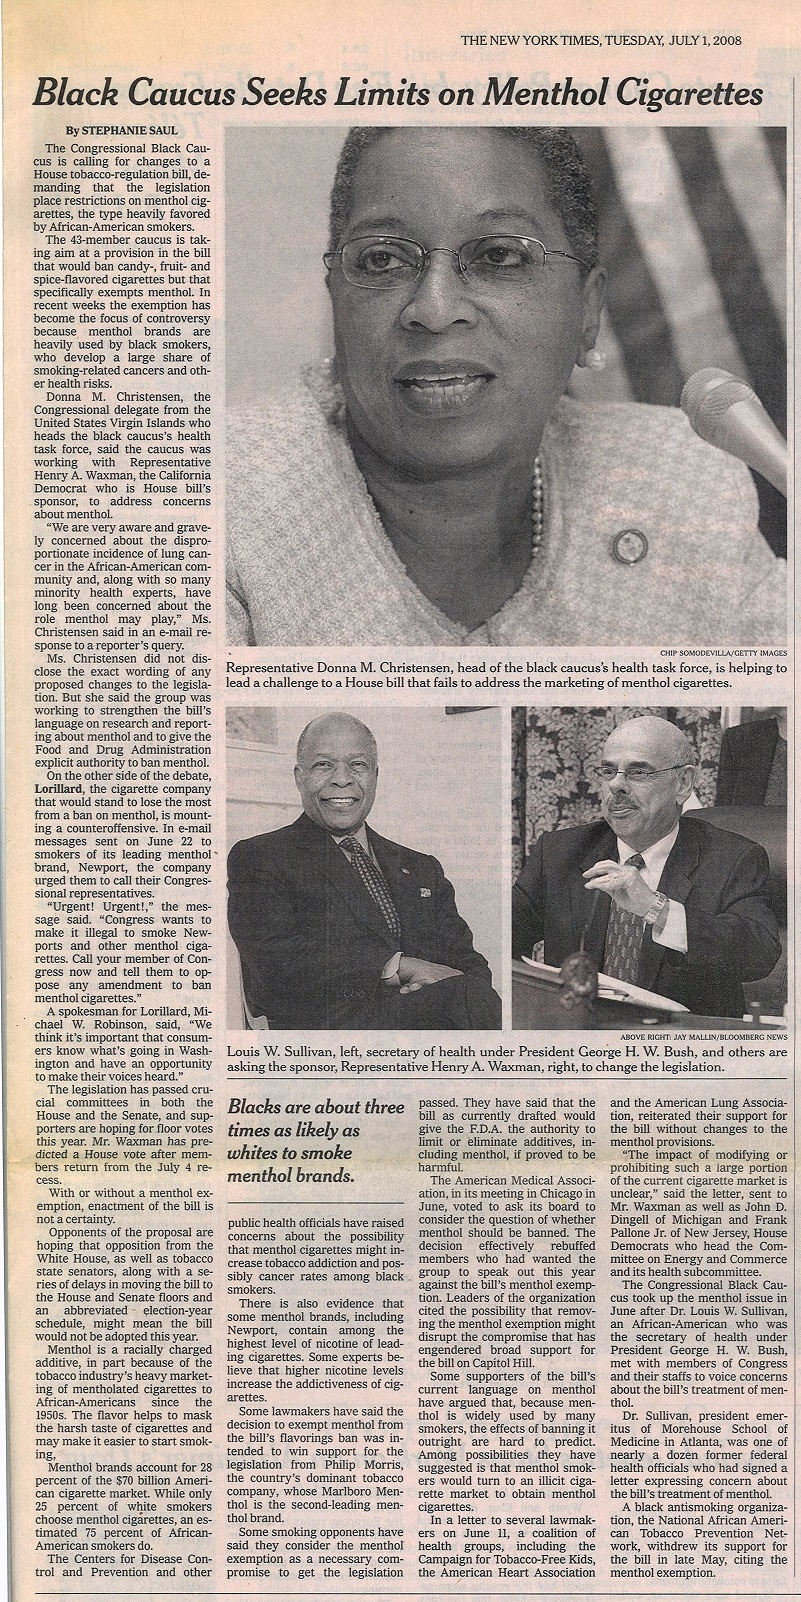 2008 07 01 NY Times Black Caucus Seeks Limits on Menthol Cigs 1